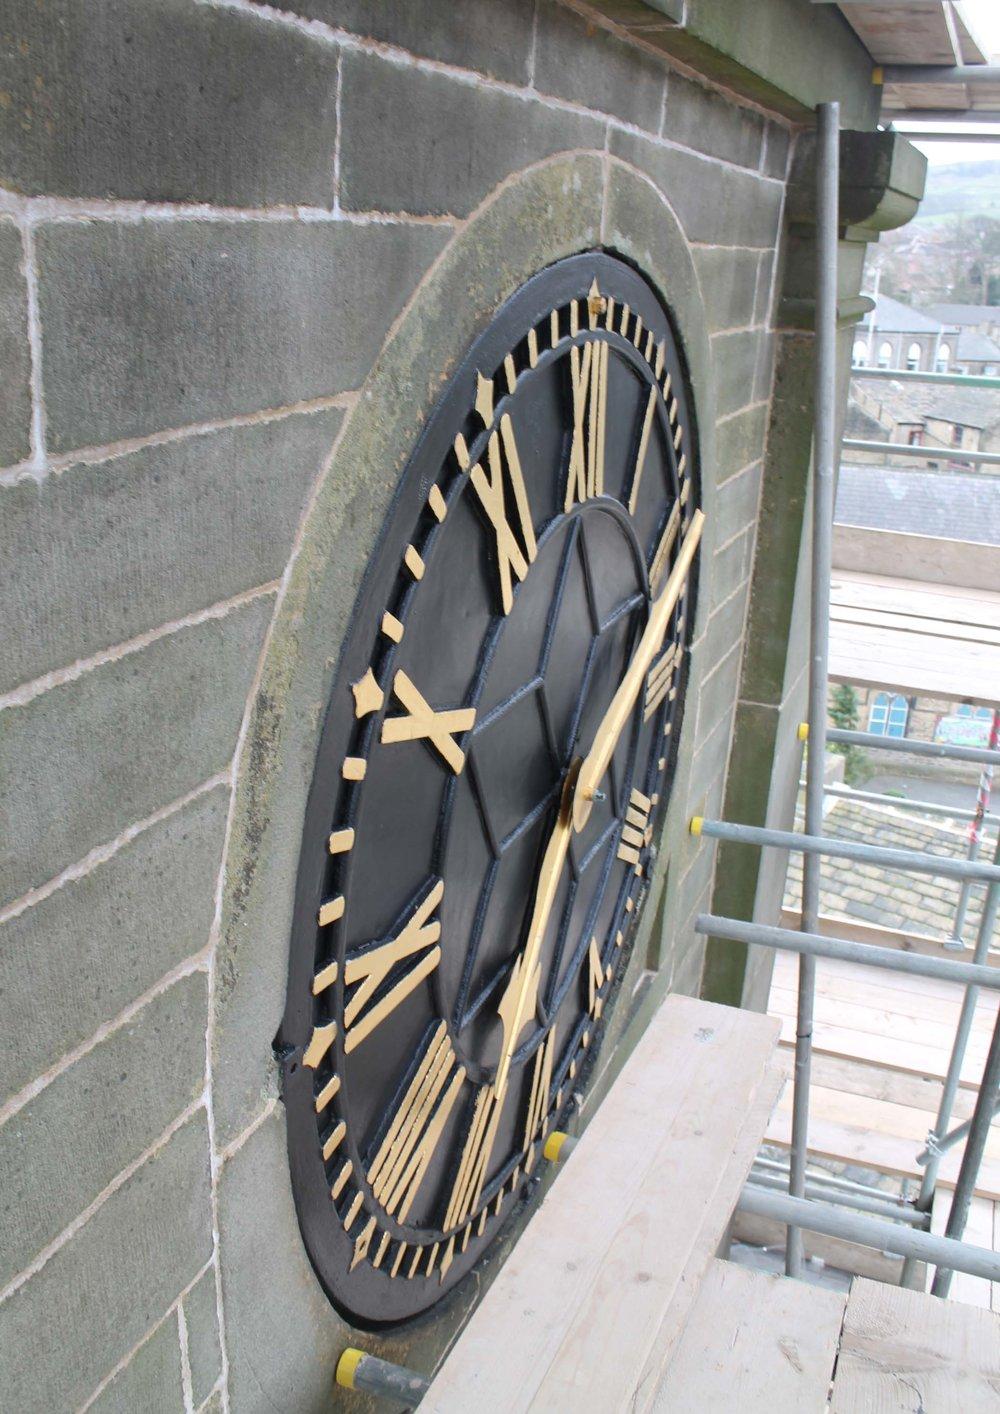 Copy of refurbished church clock face photograph